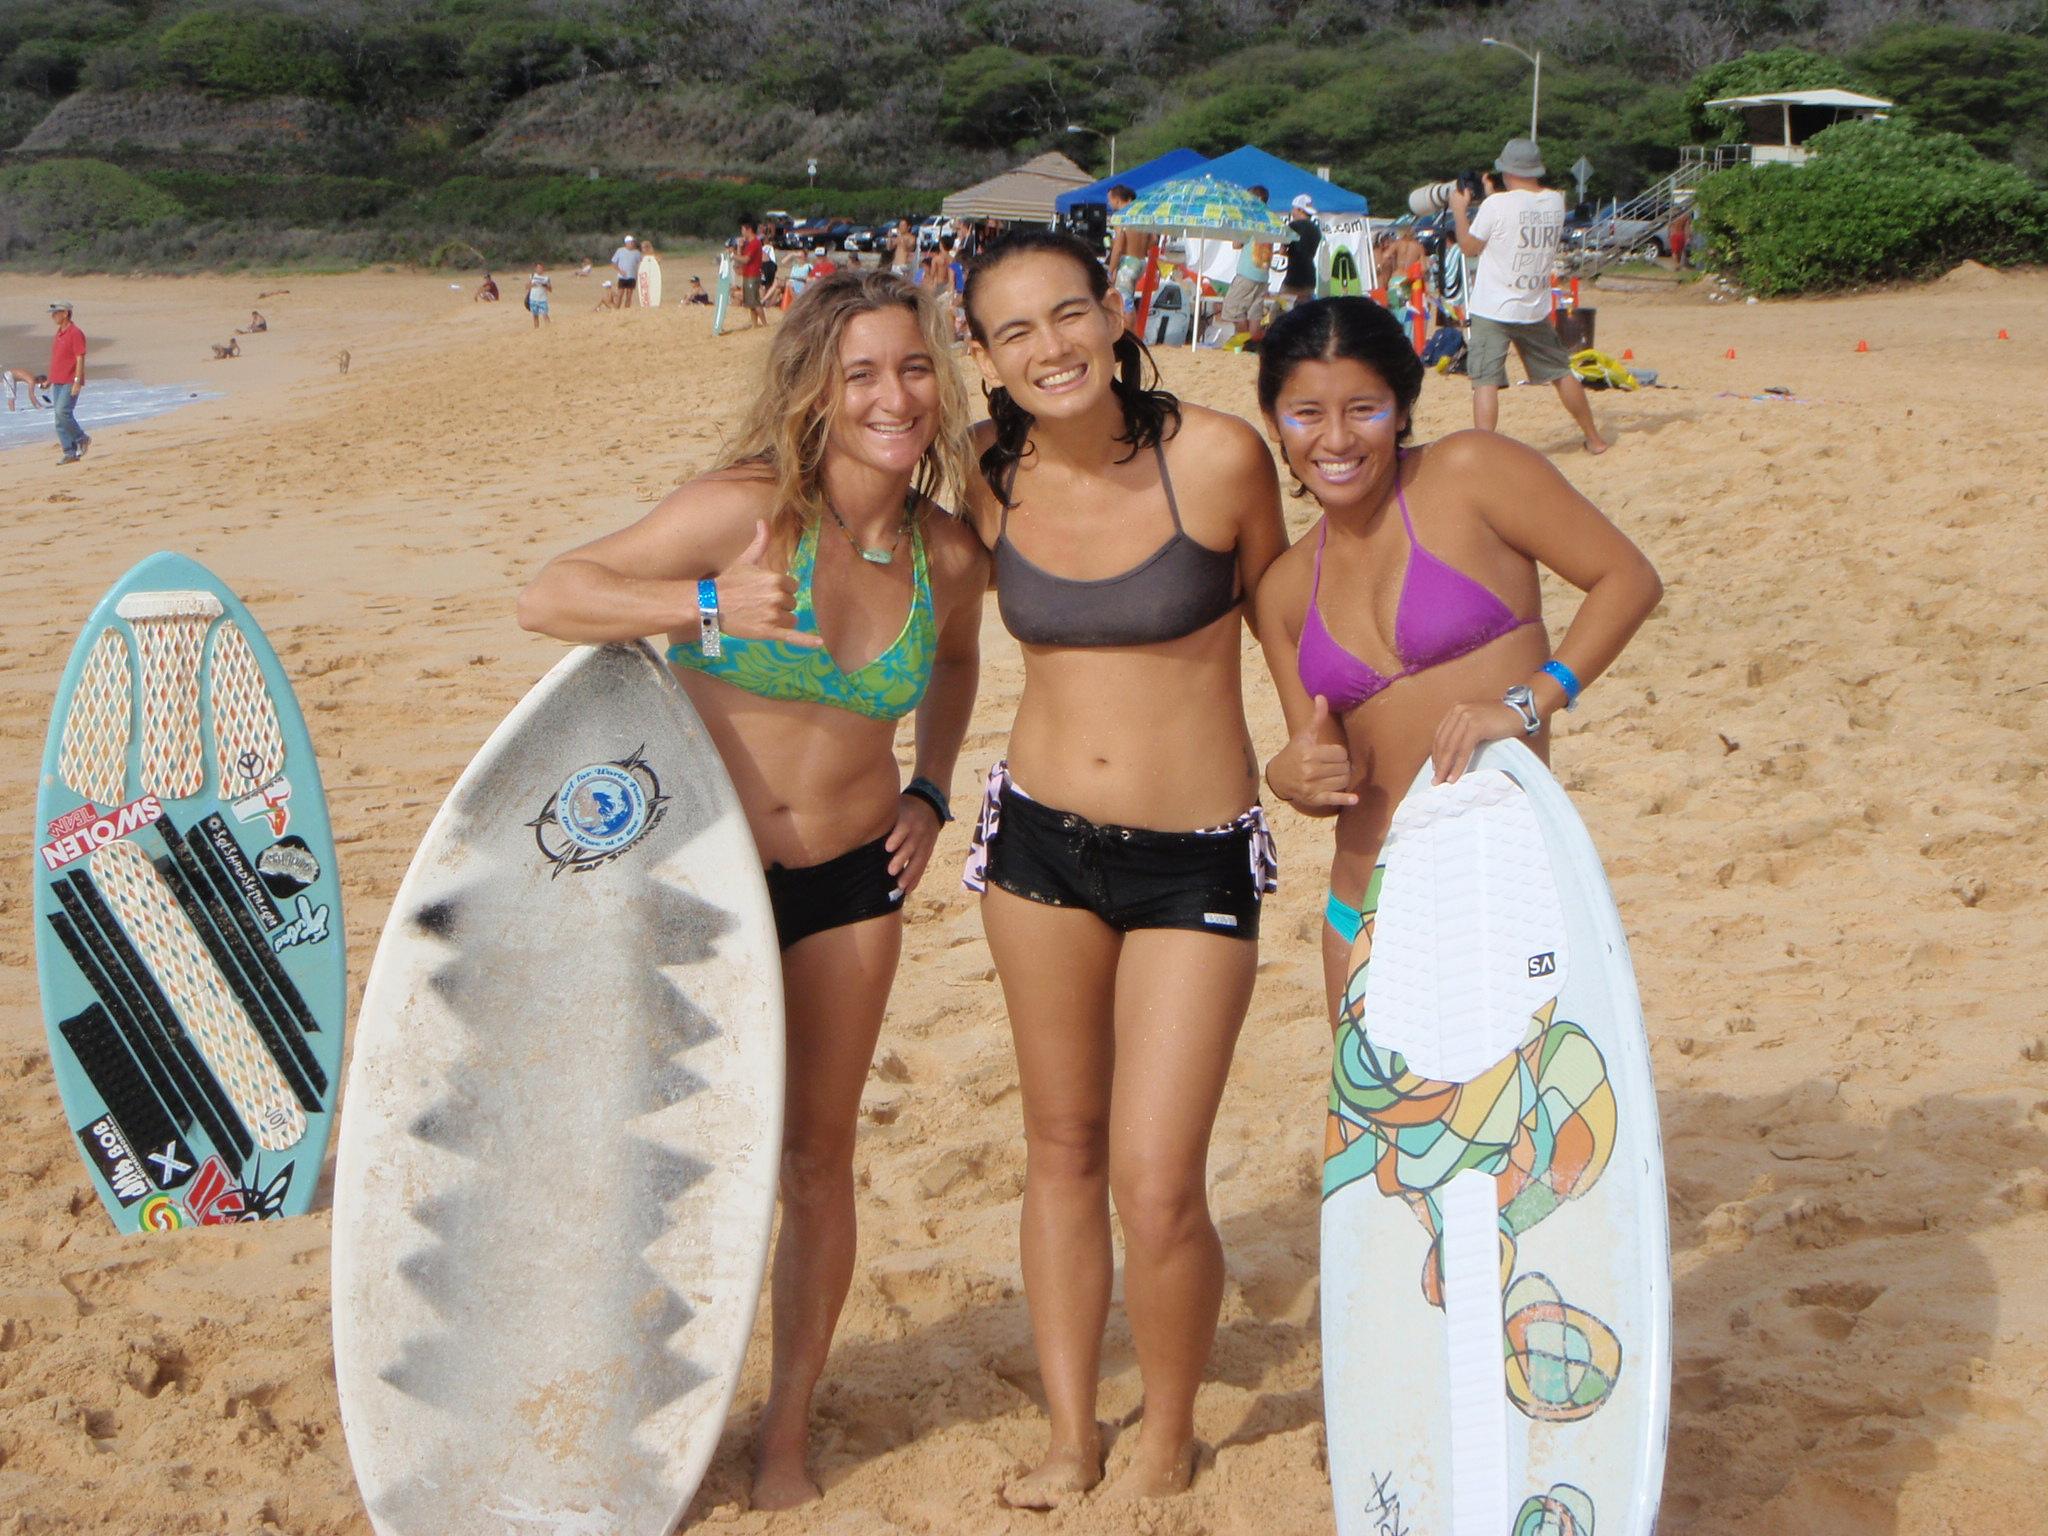 hawaii amateur skimboard league - maui surfer girls